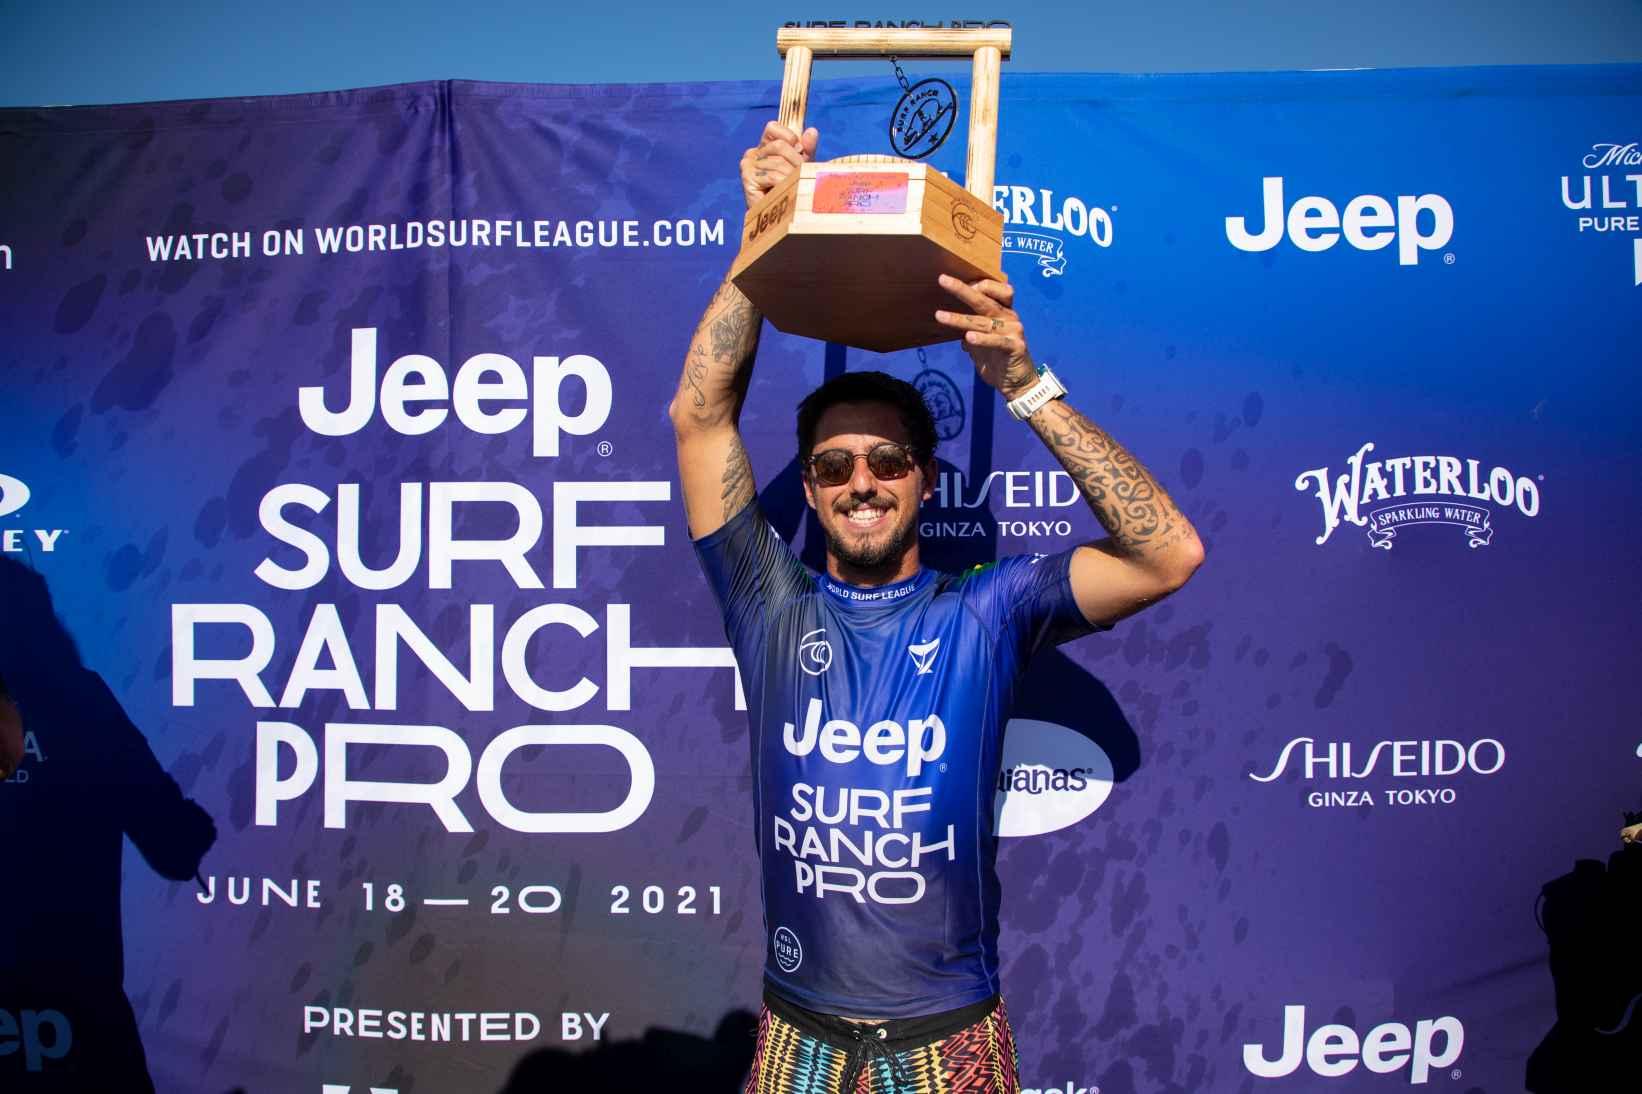 surf30 surf ranch pro 2021 wsl surf Toledo F Ranch21 Heff 8770